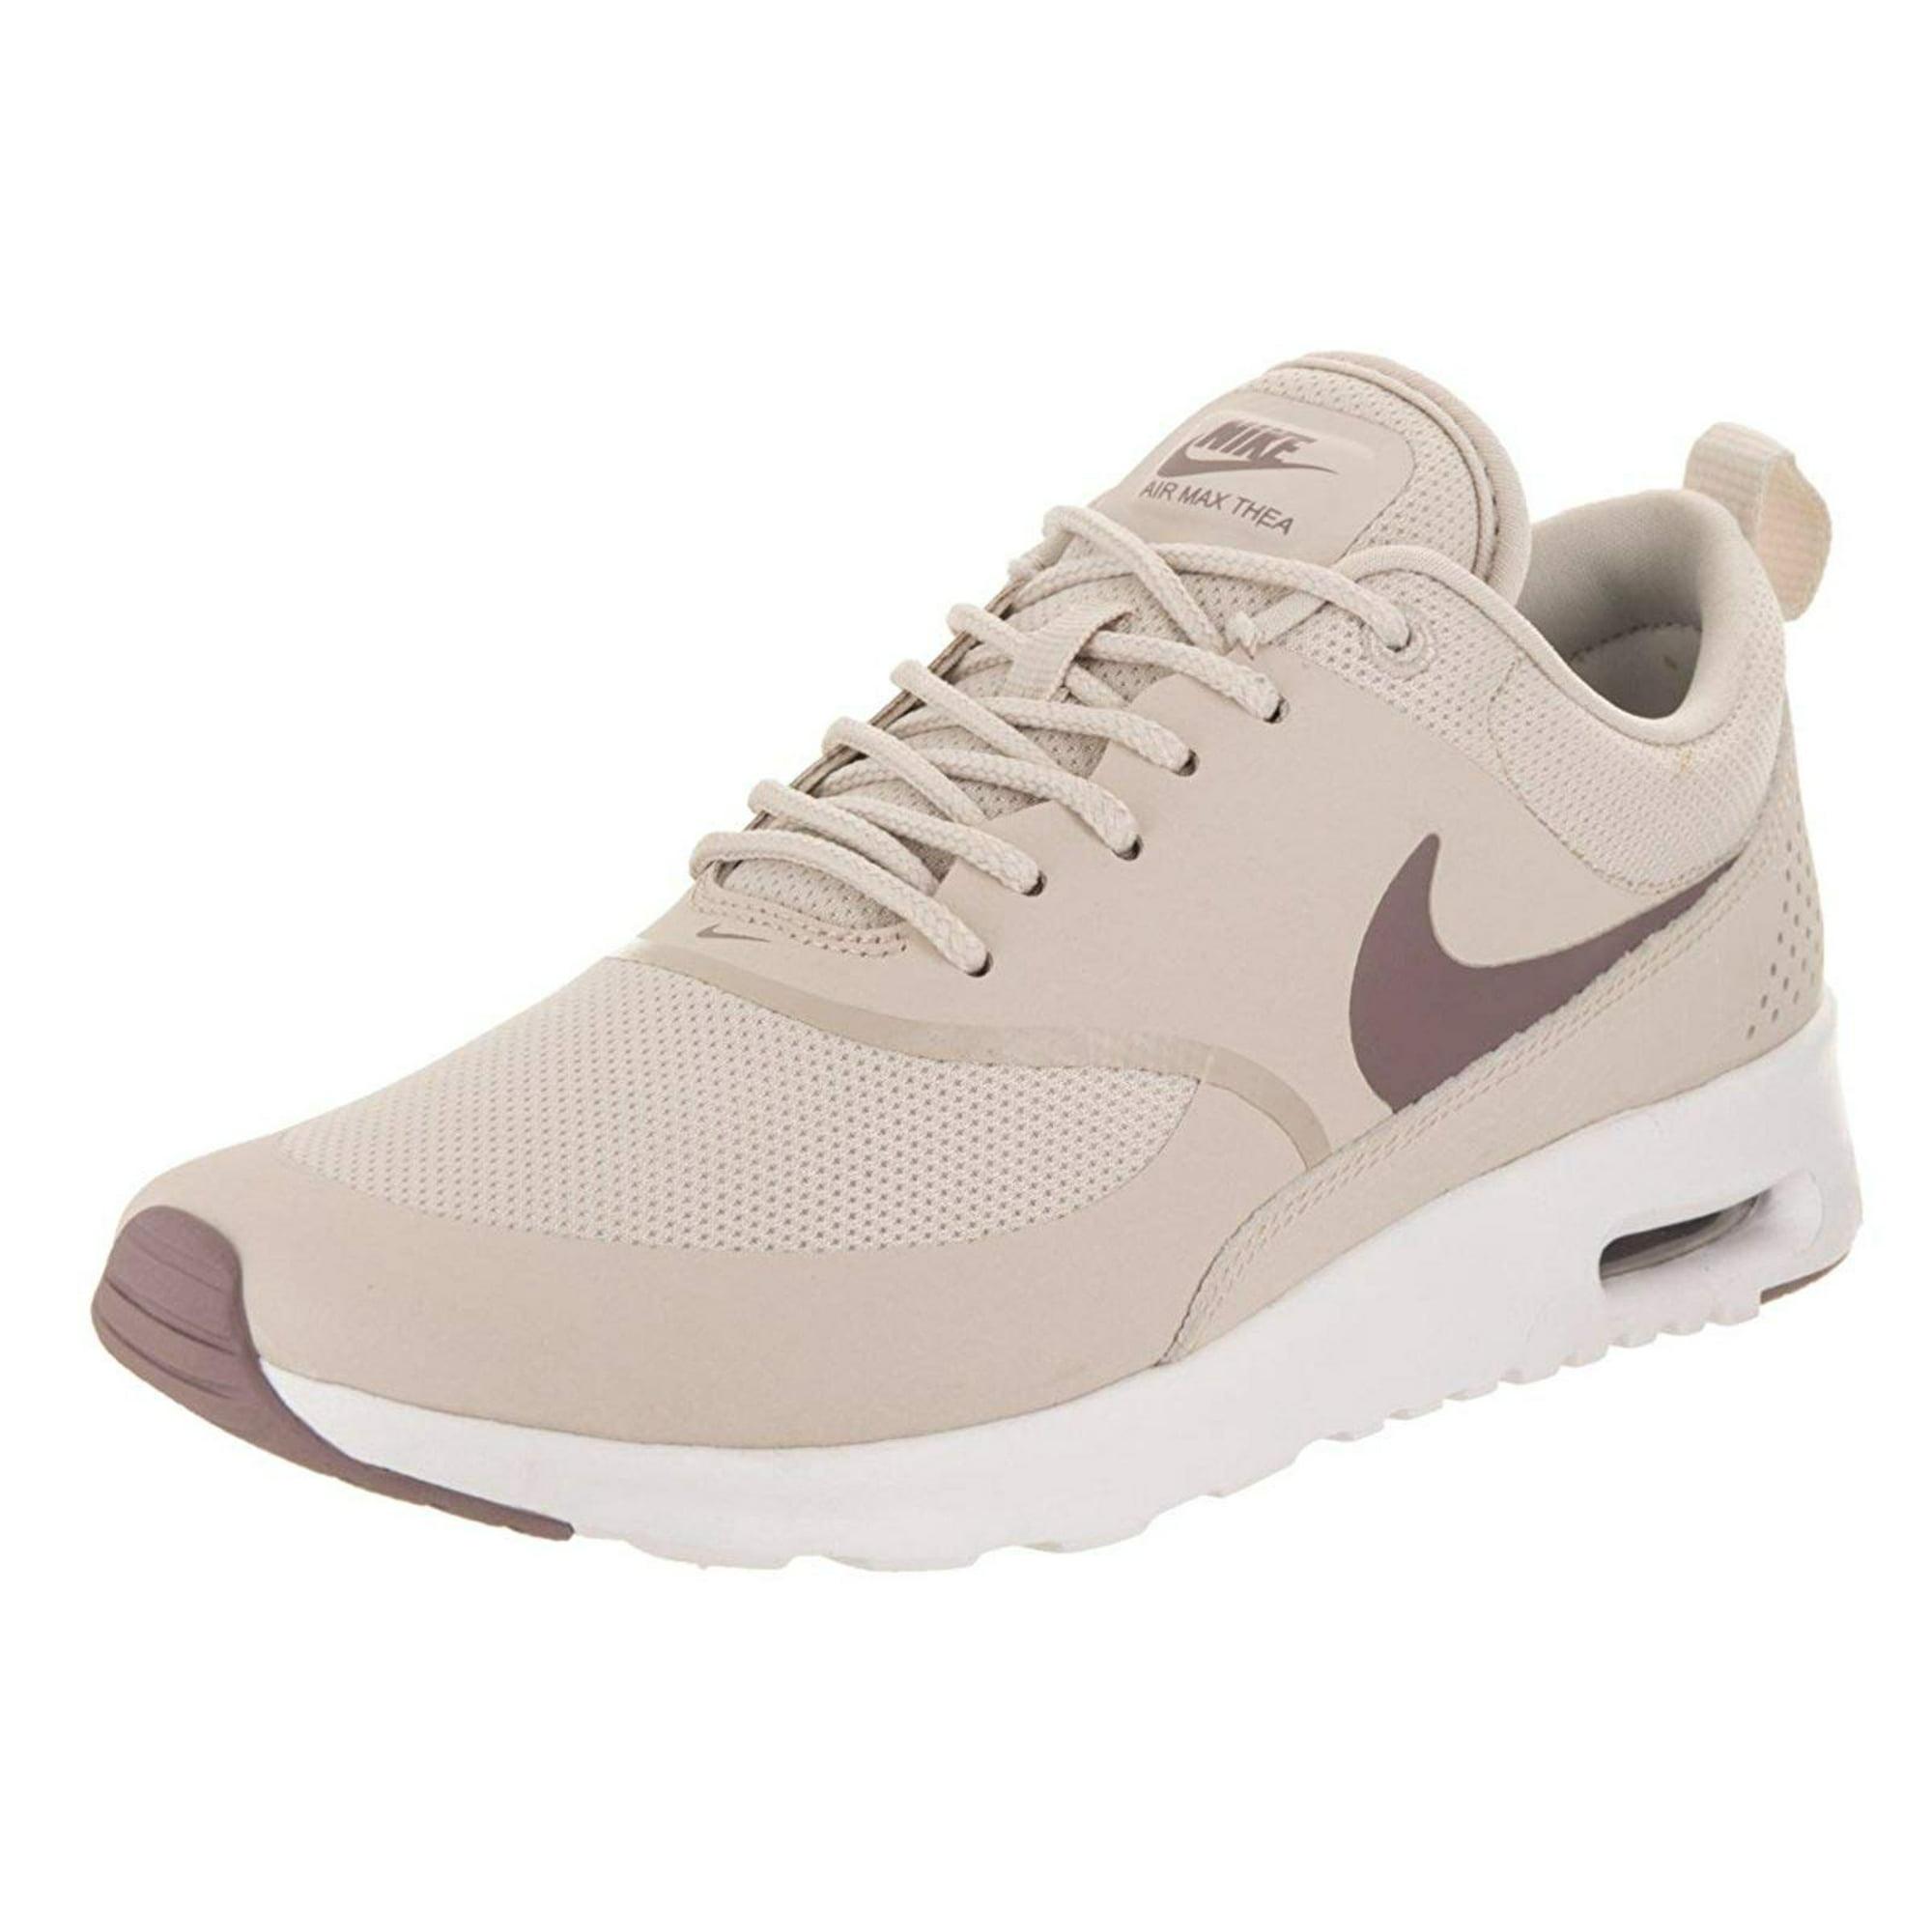 Nike Damen Sneaker Air Max Thea Lt Orewood BrnTaupe Grey